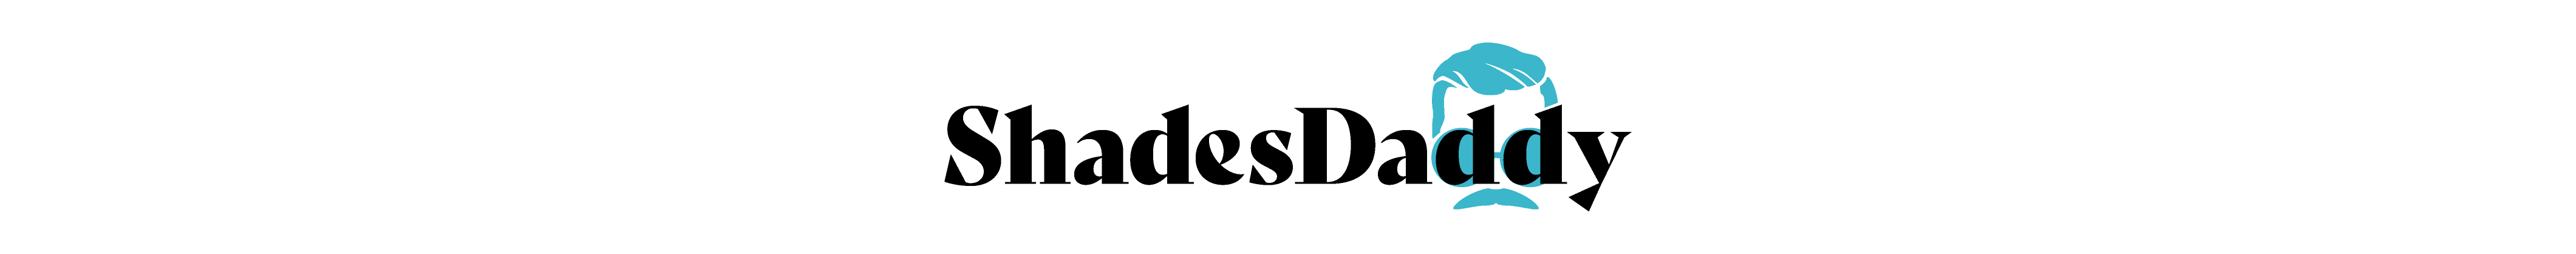 Sunglasses and Style Blog – ShadesDaddy.com